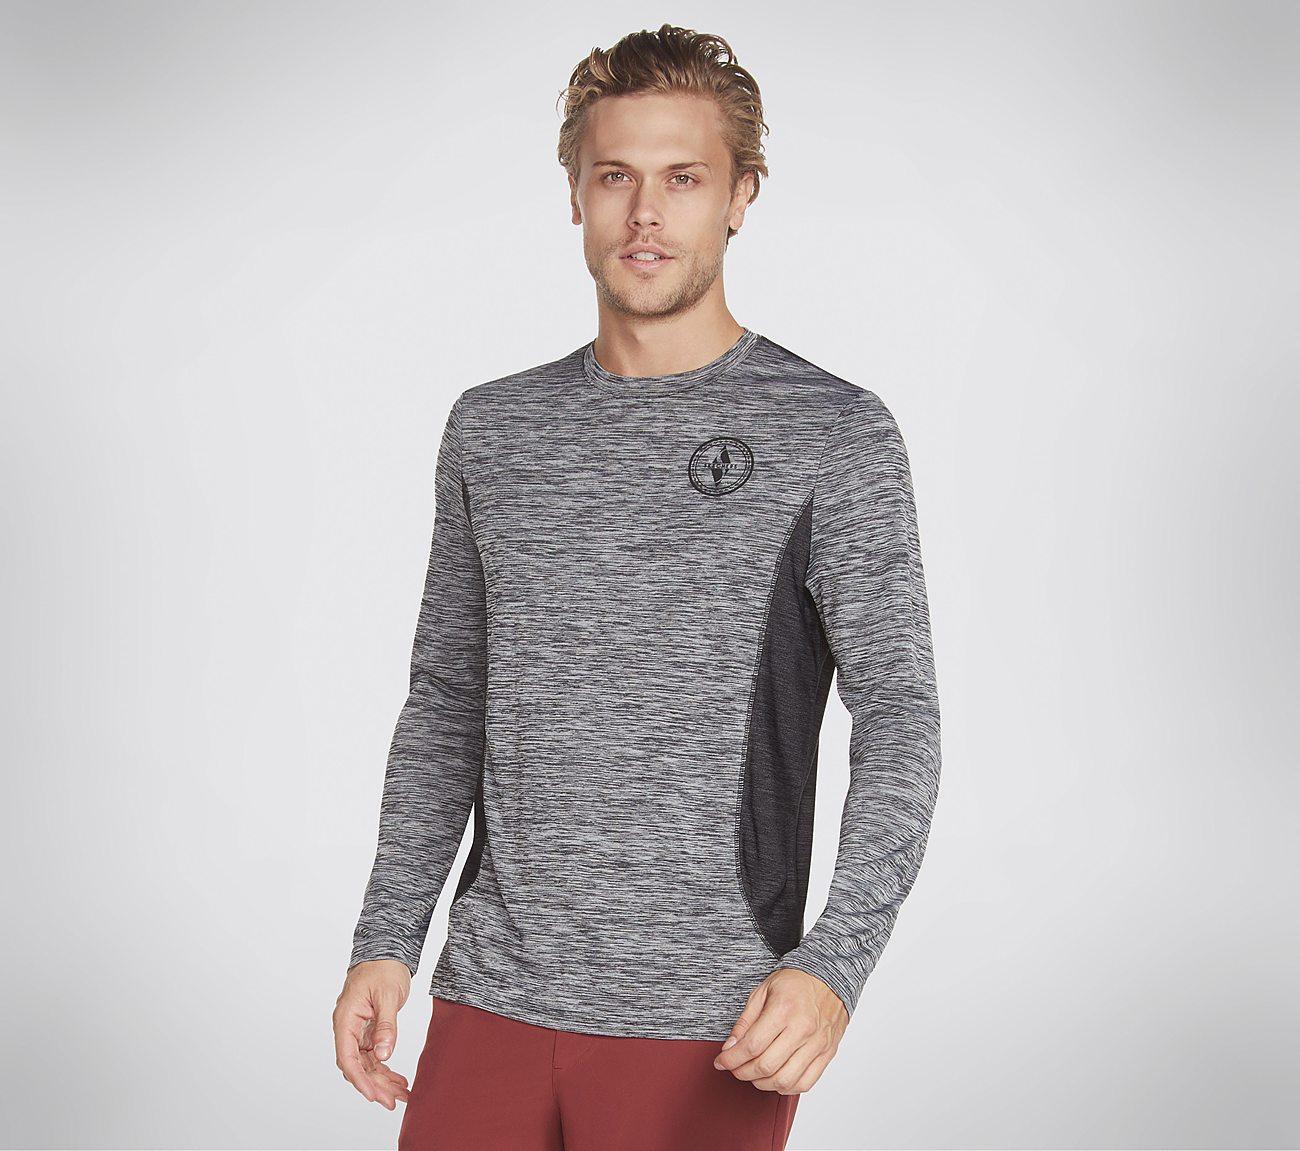 Skechers Apparel Range Long Sleeve Tech Tee Shirt